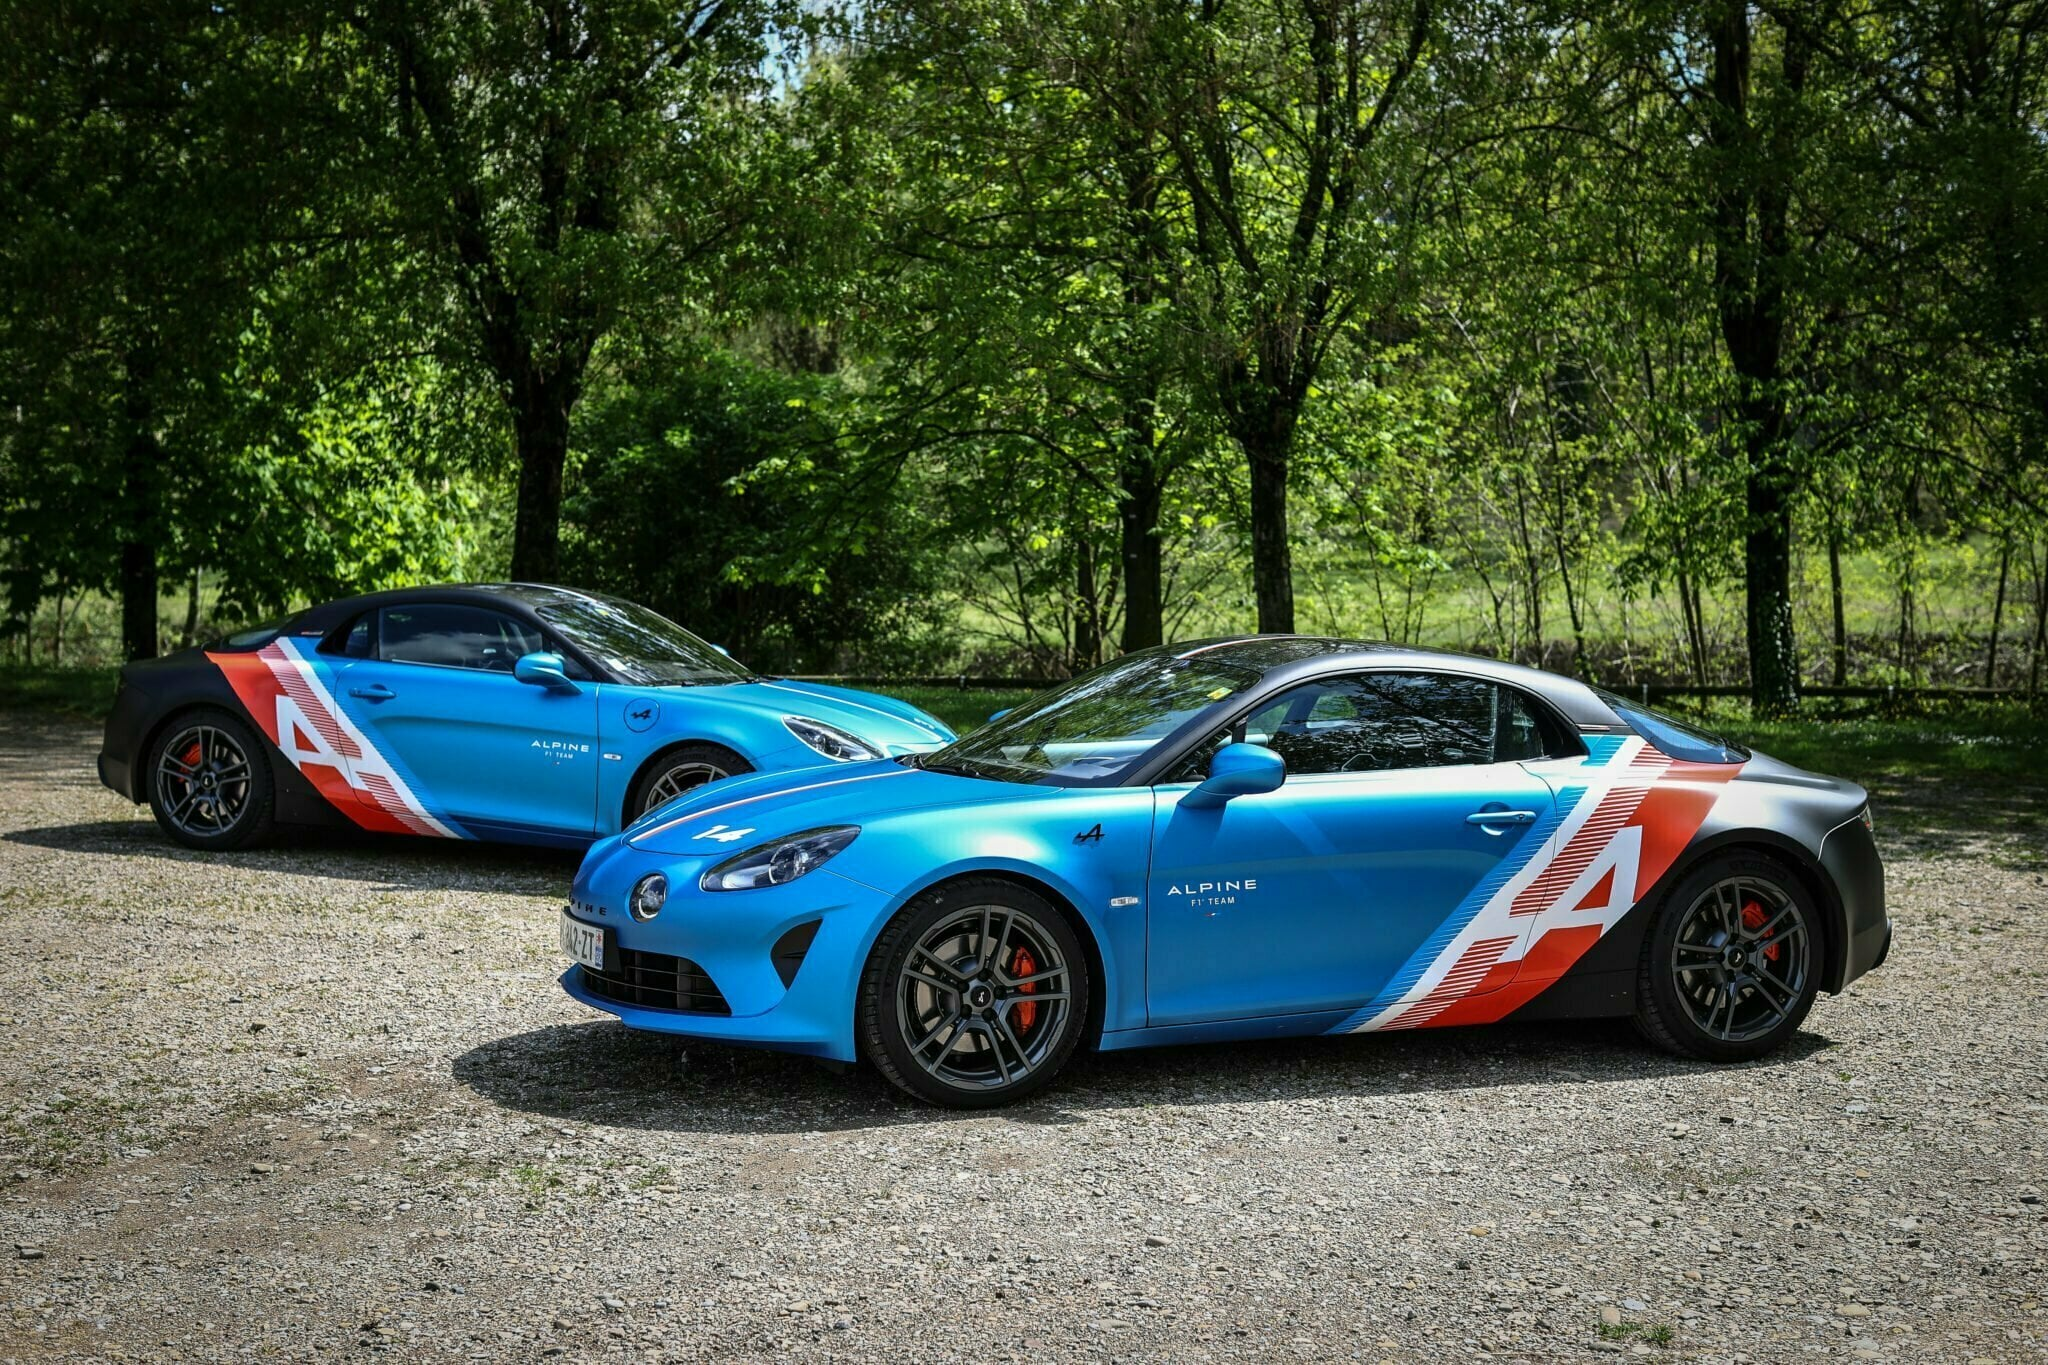 Alpine A110 Trackside Alonso Ocon 2021 16 | Alpine A110 Trackside : la berlinette aux couleurs de la F1